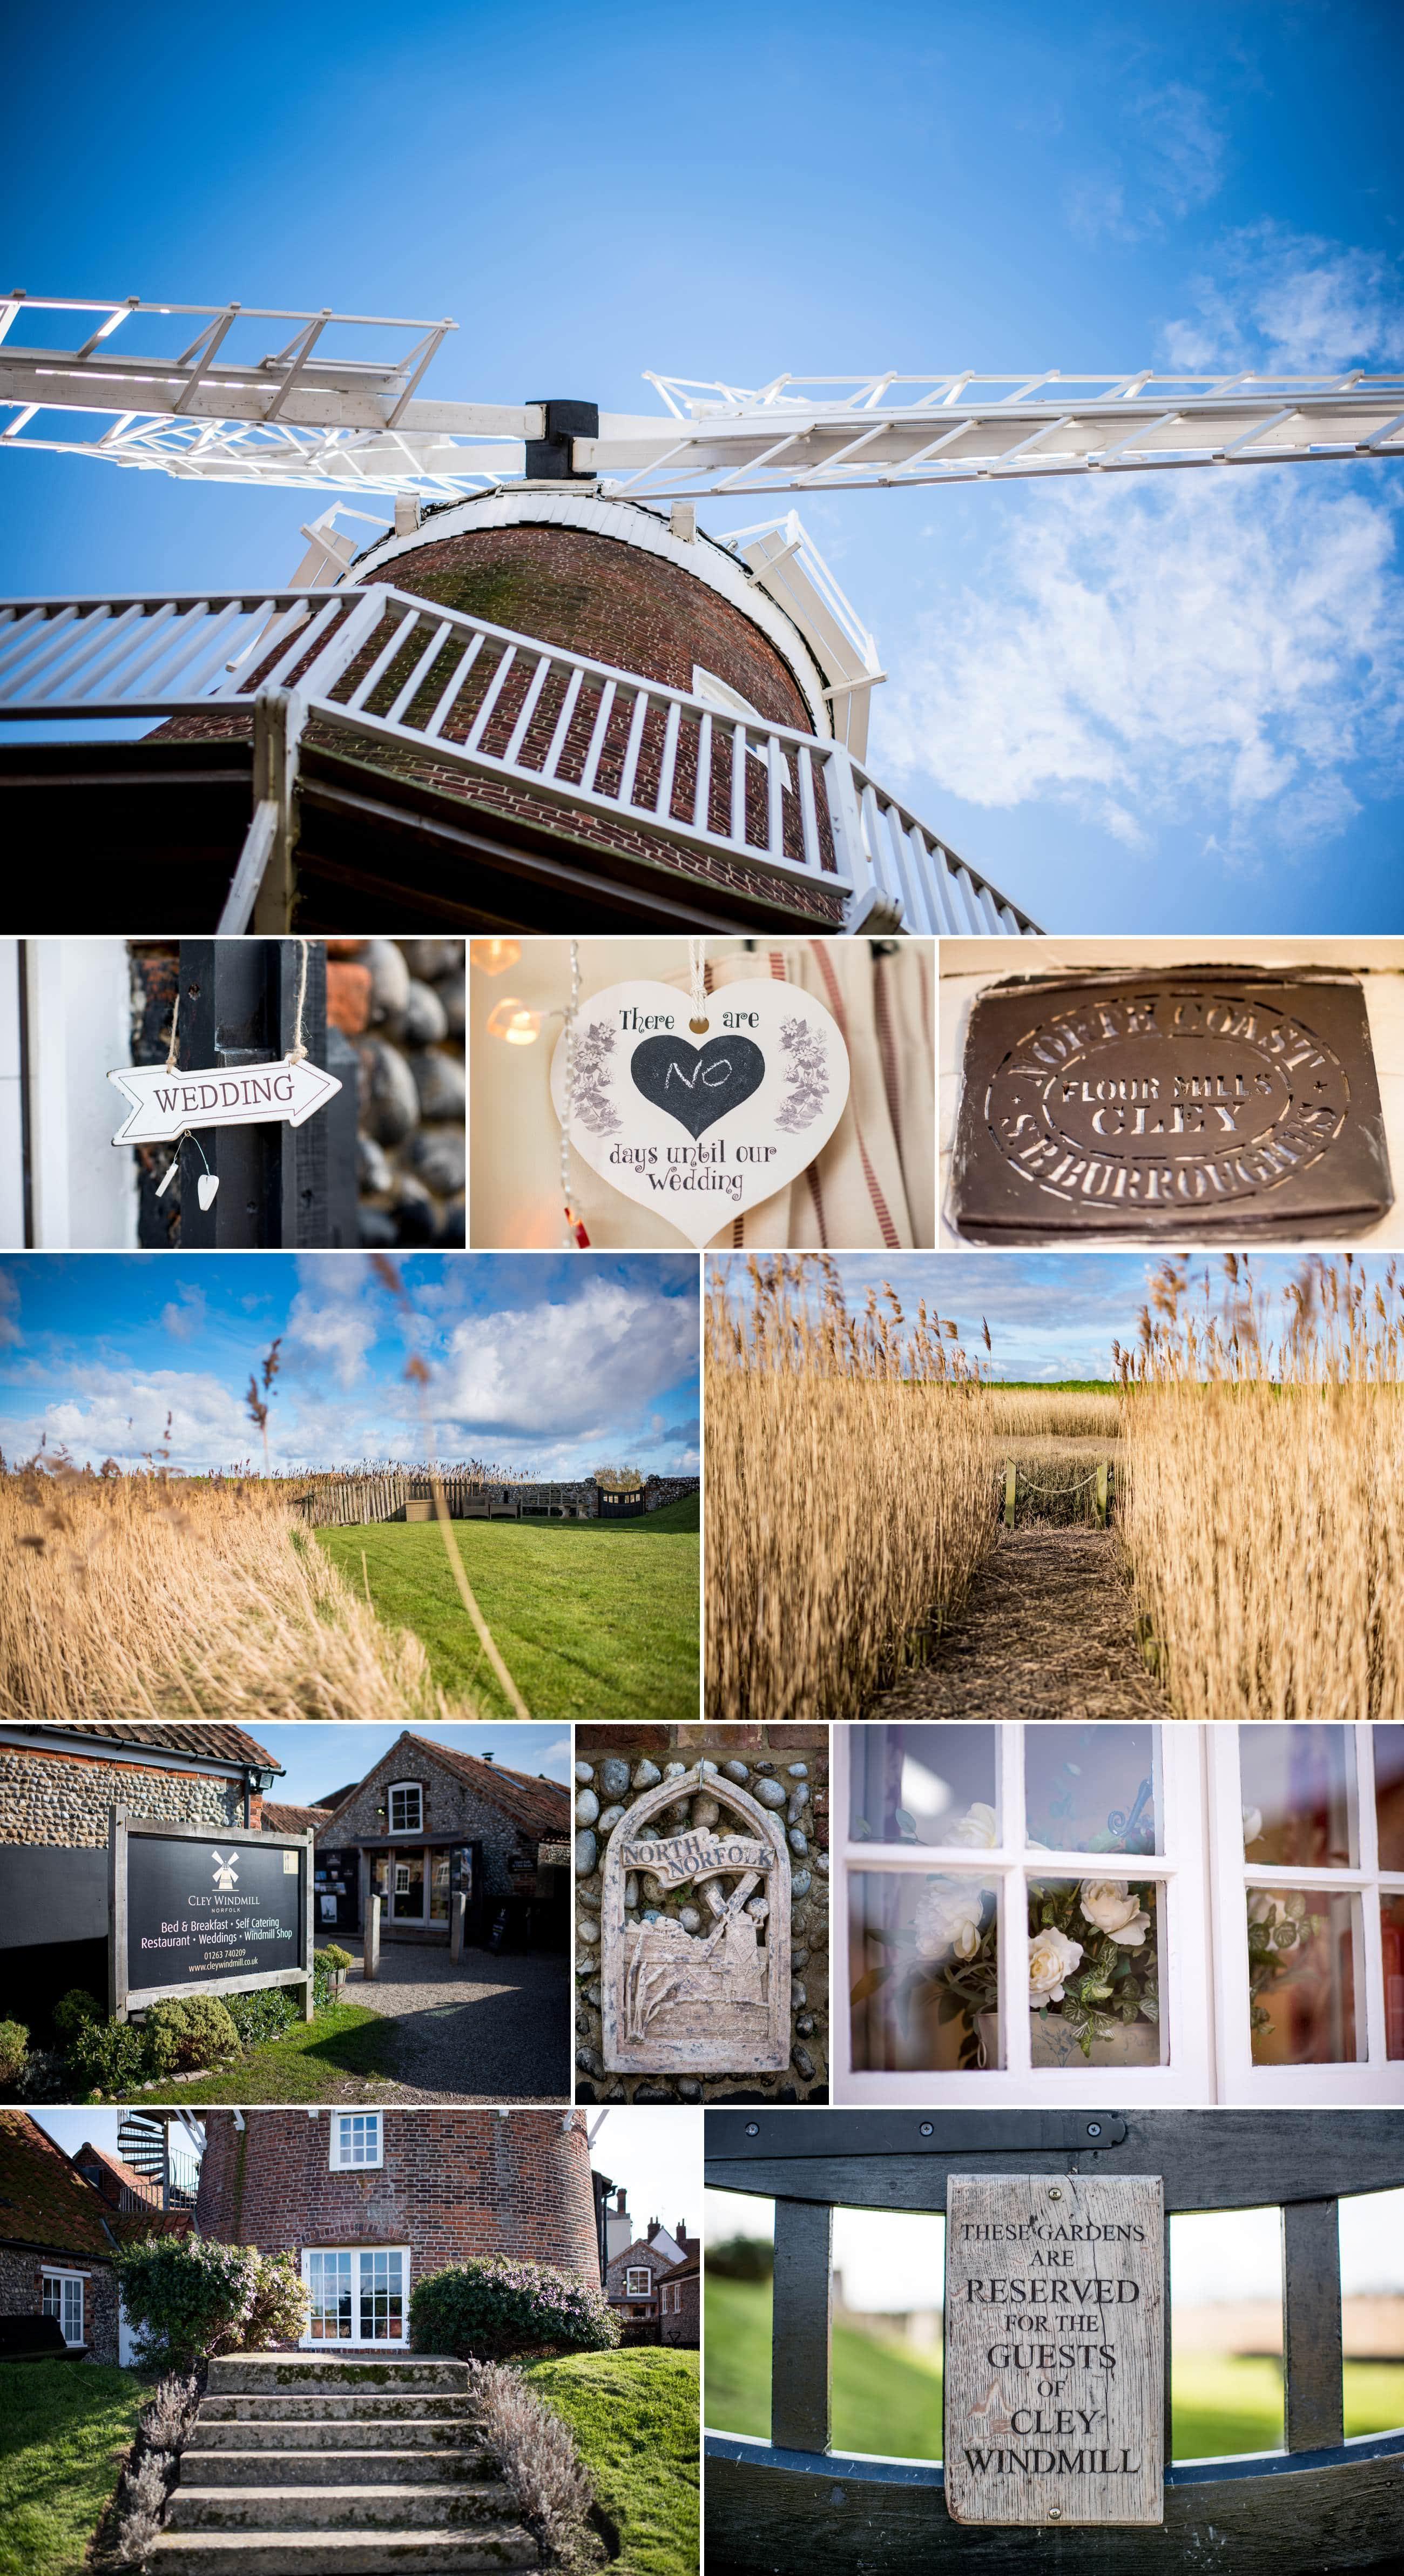 Nicola_Andy_Cley_Windmill_Norfolk_Wedding 1